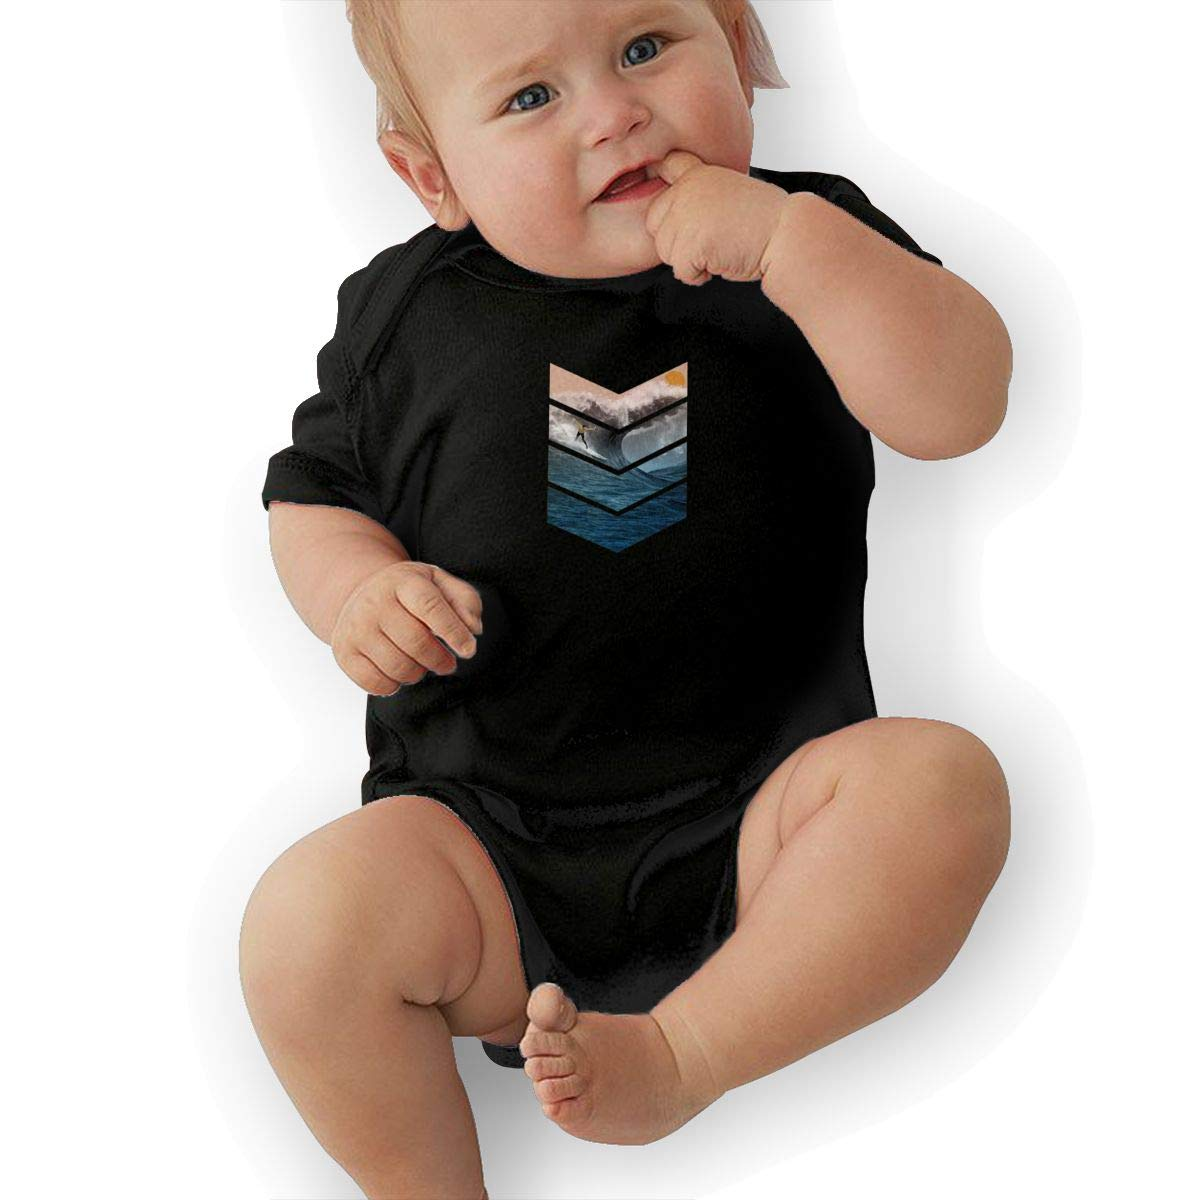 HappyLifea Sunrise Surfer Baby Pajamas Bodysuits Clothes Onesies Jumpsuits Outfits Black